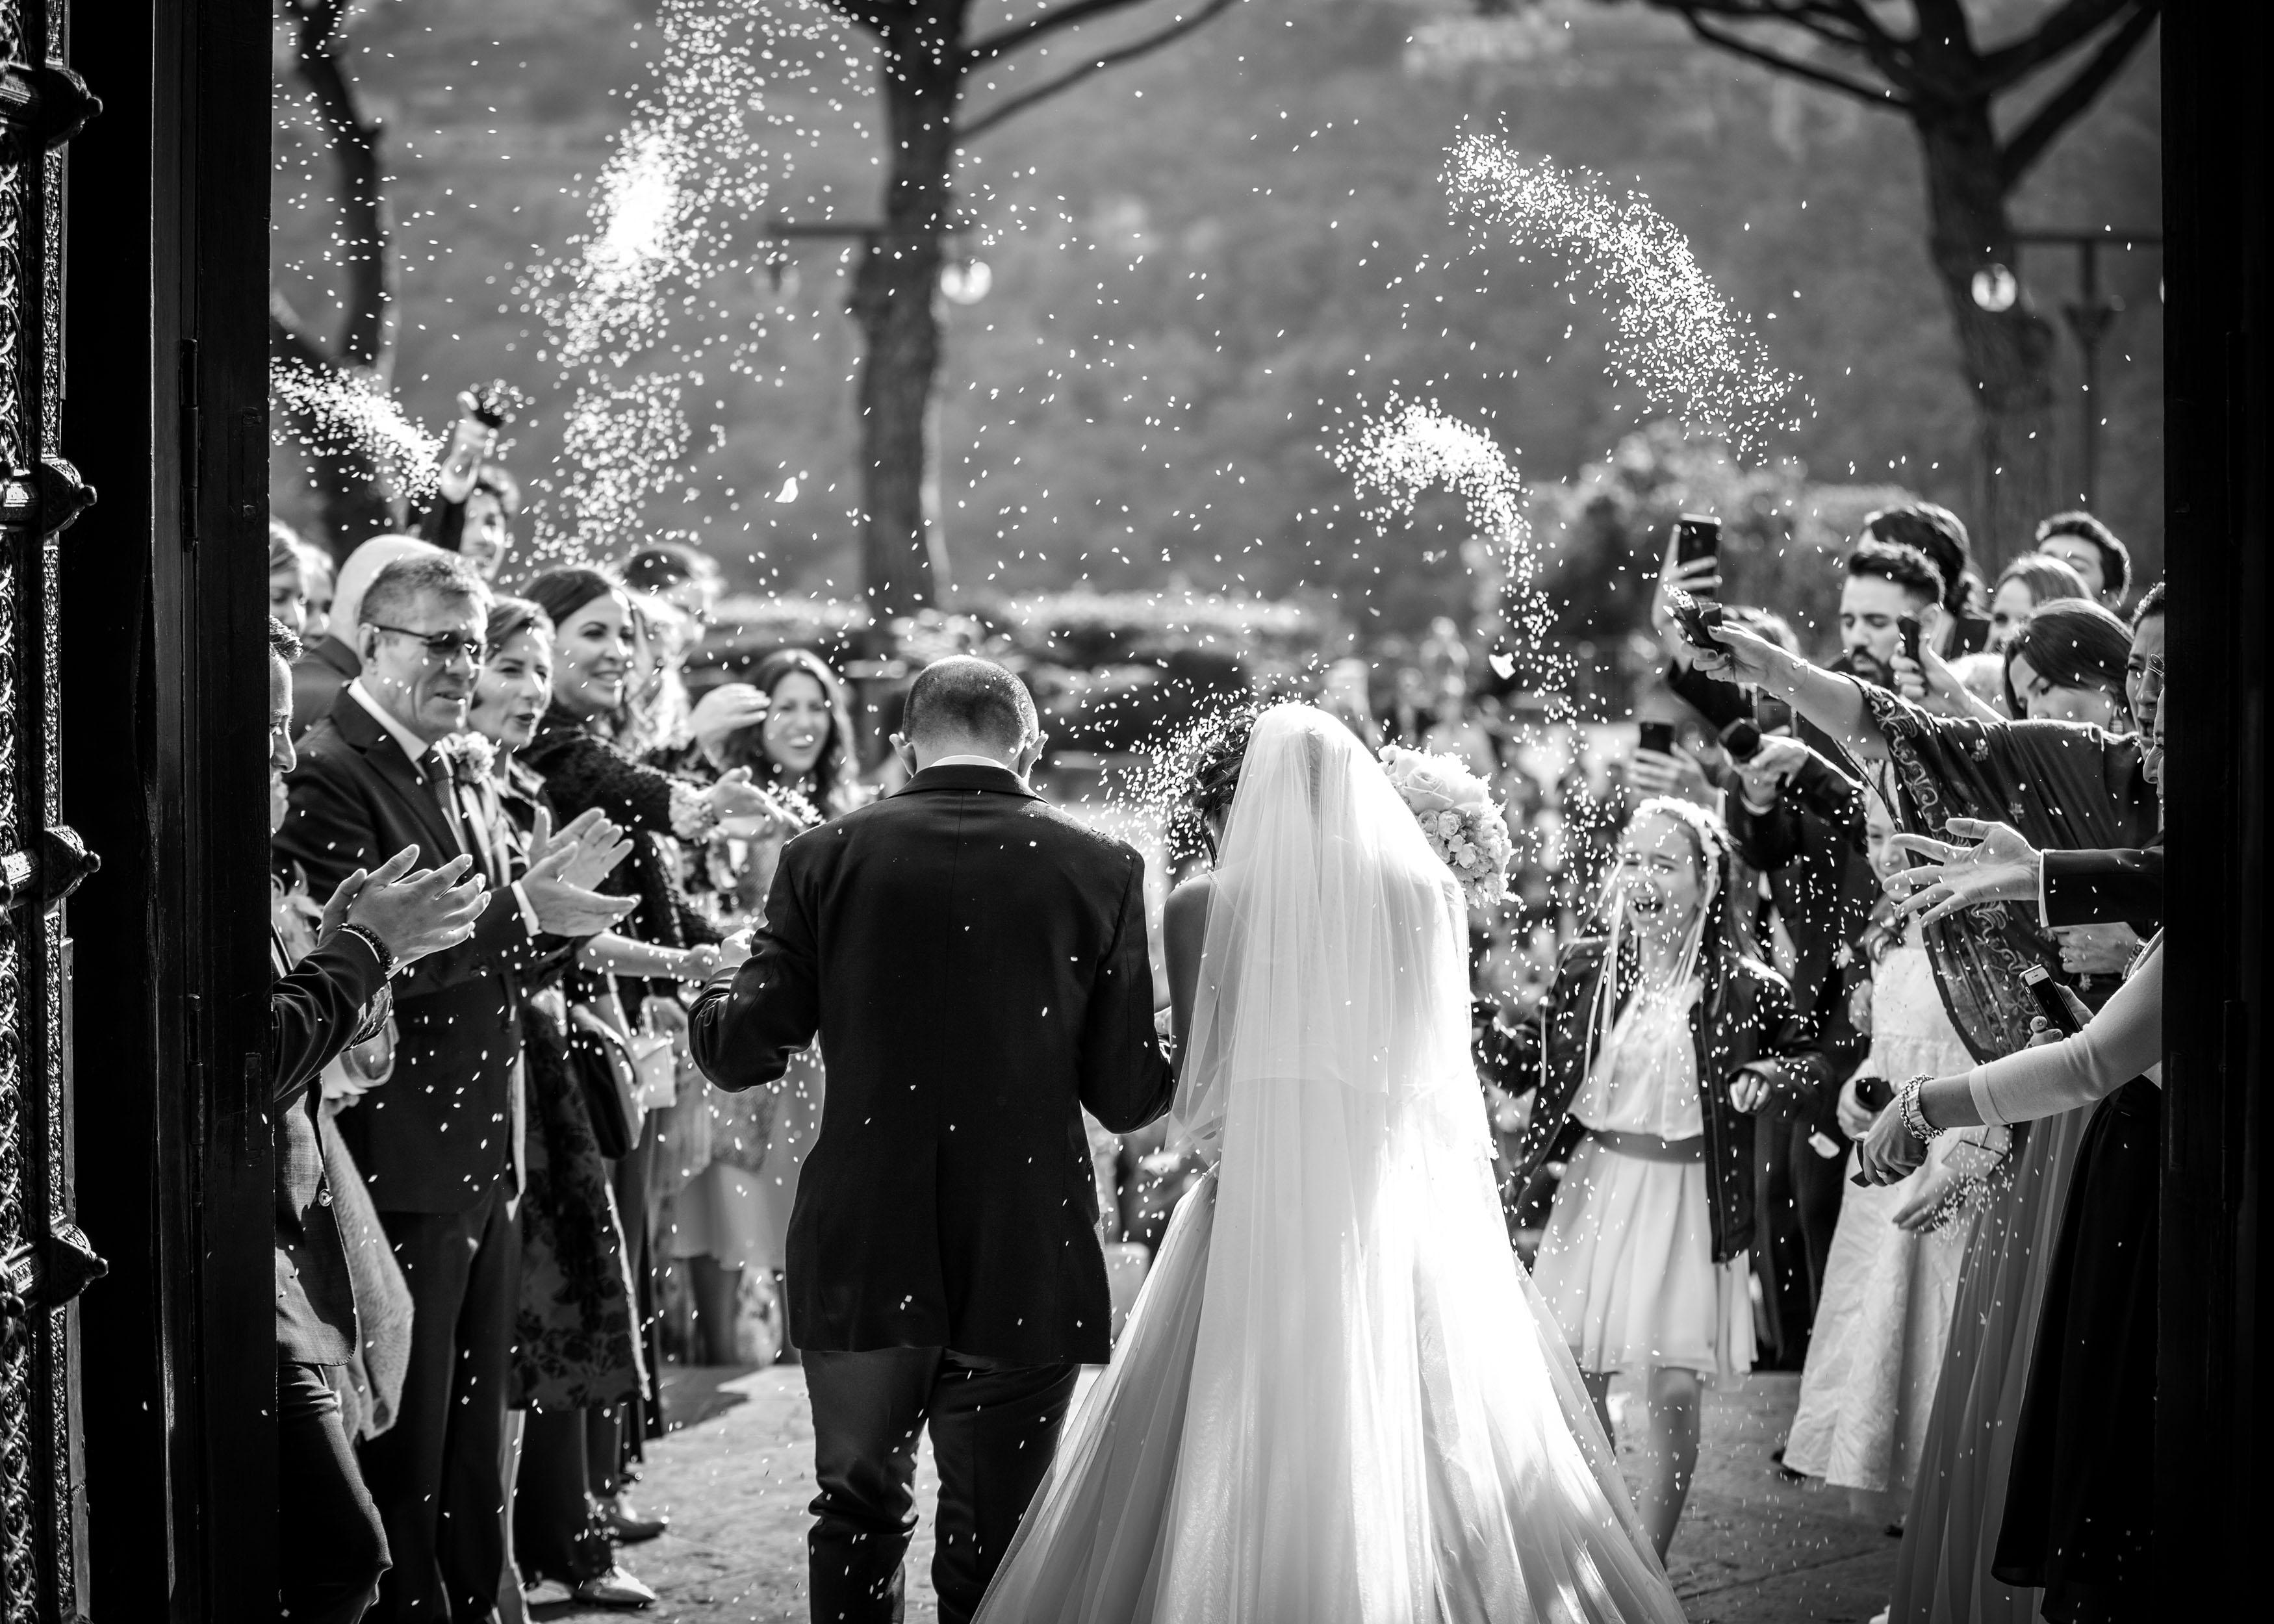 http://www.weddingamalfi.com/wp-content/uploads/Katia-Jorge-18-maggio-2019-29.jpg